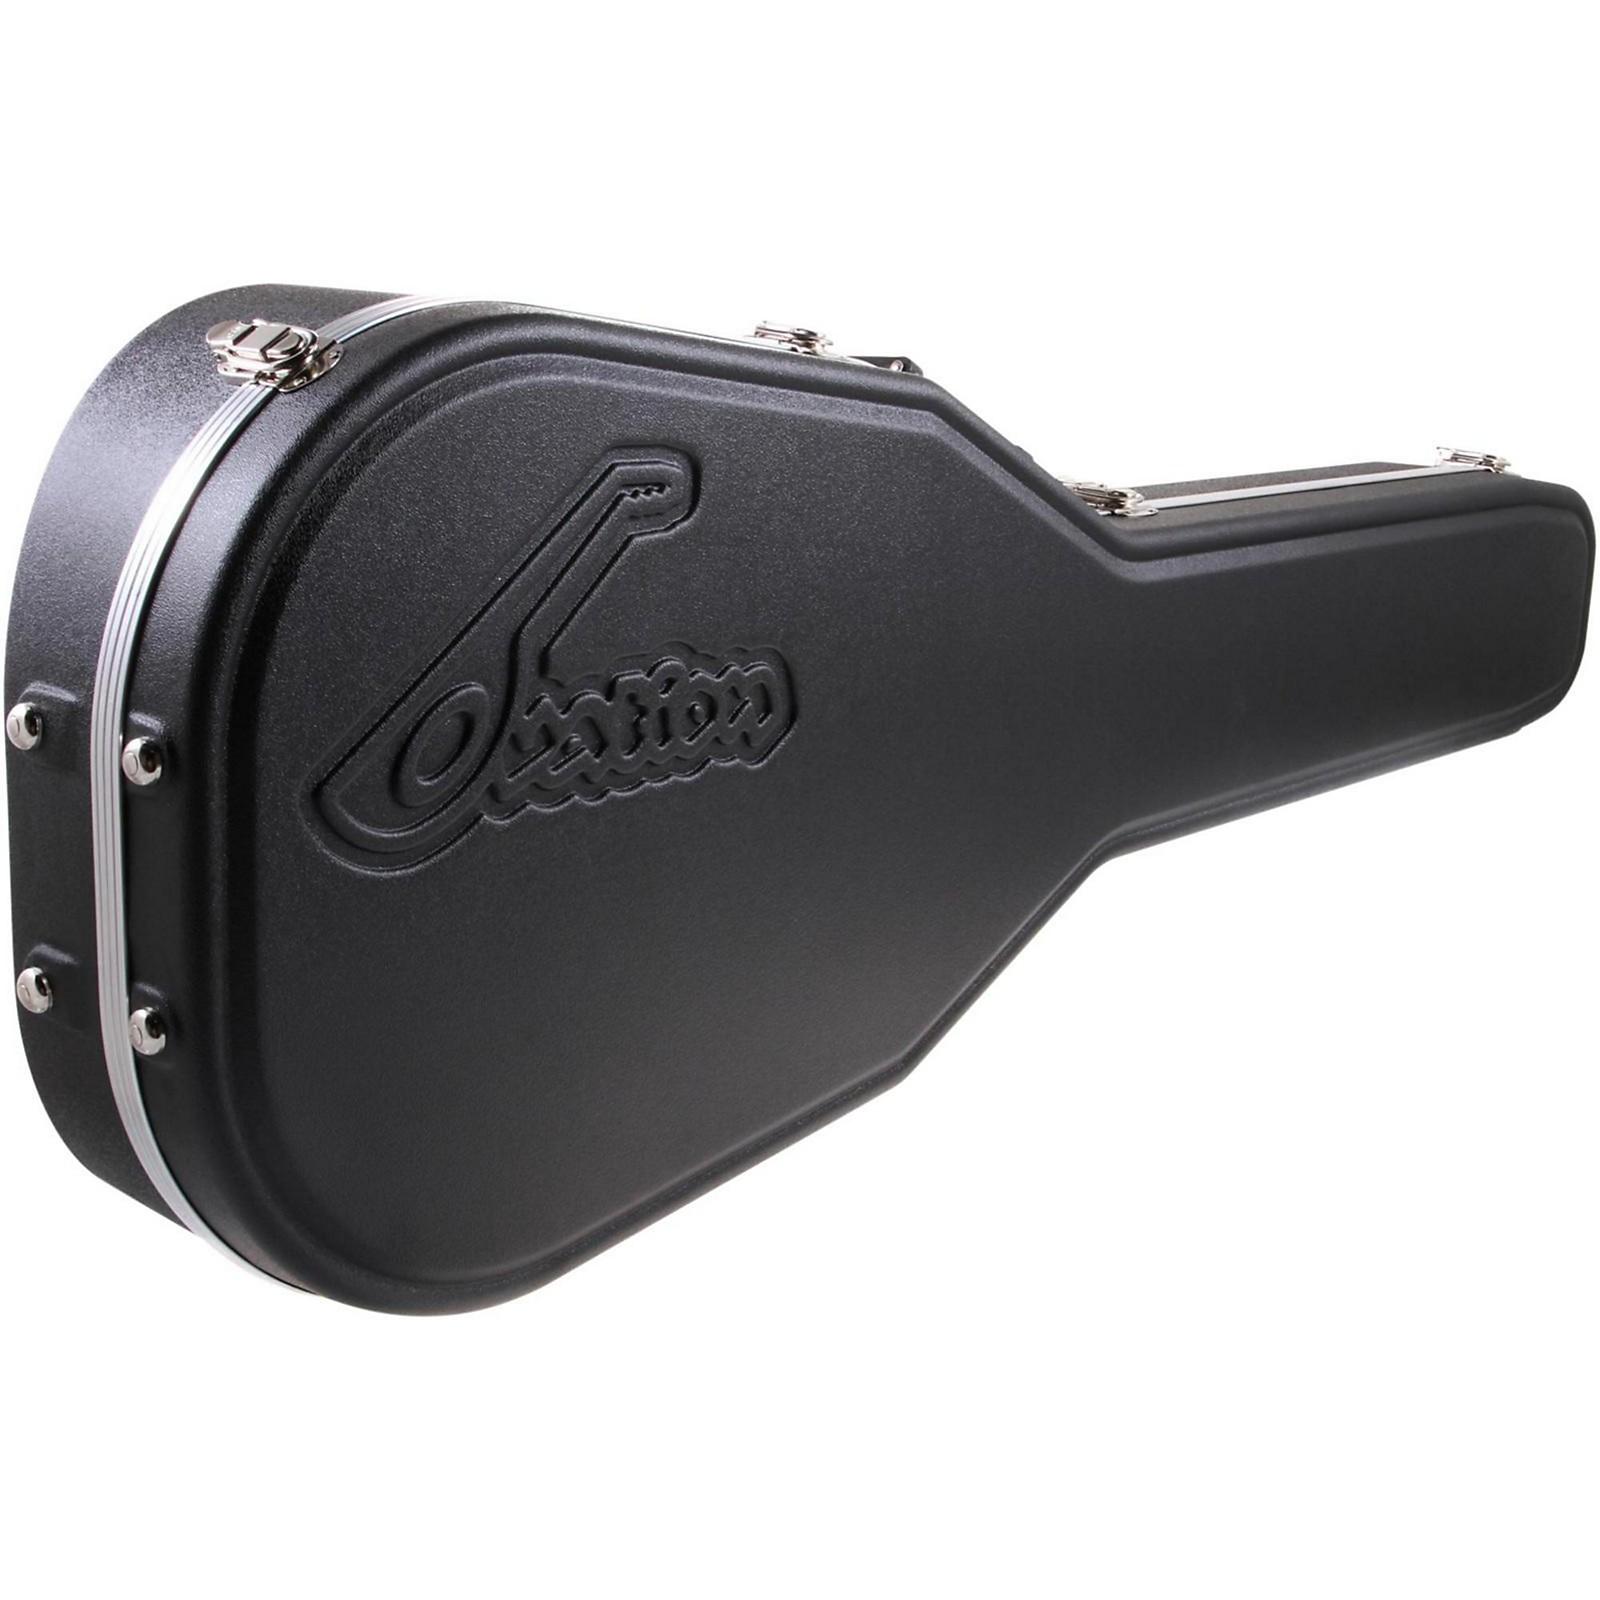 Ovation 8158 Guitar Case